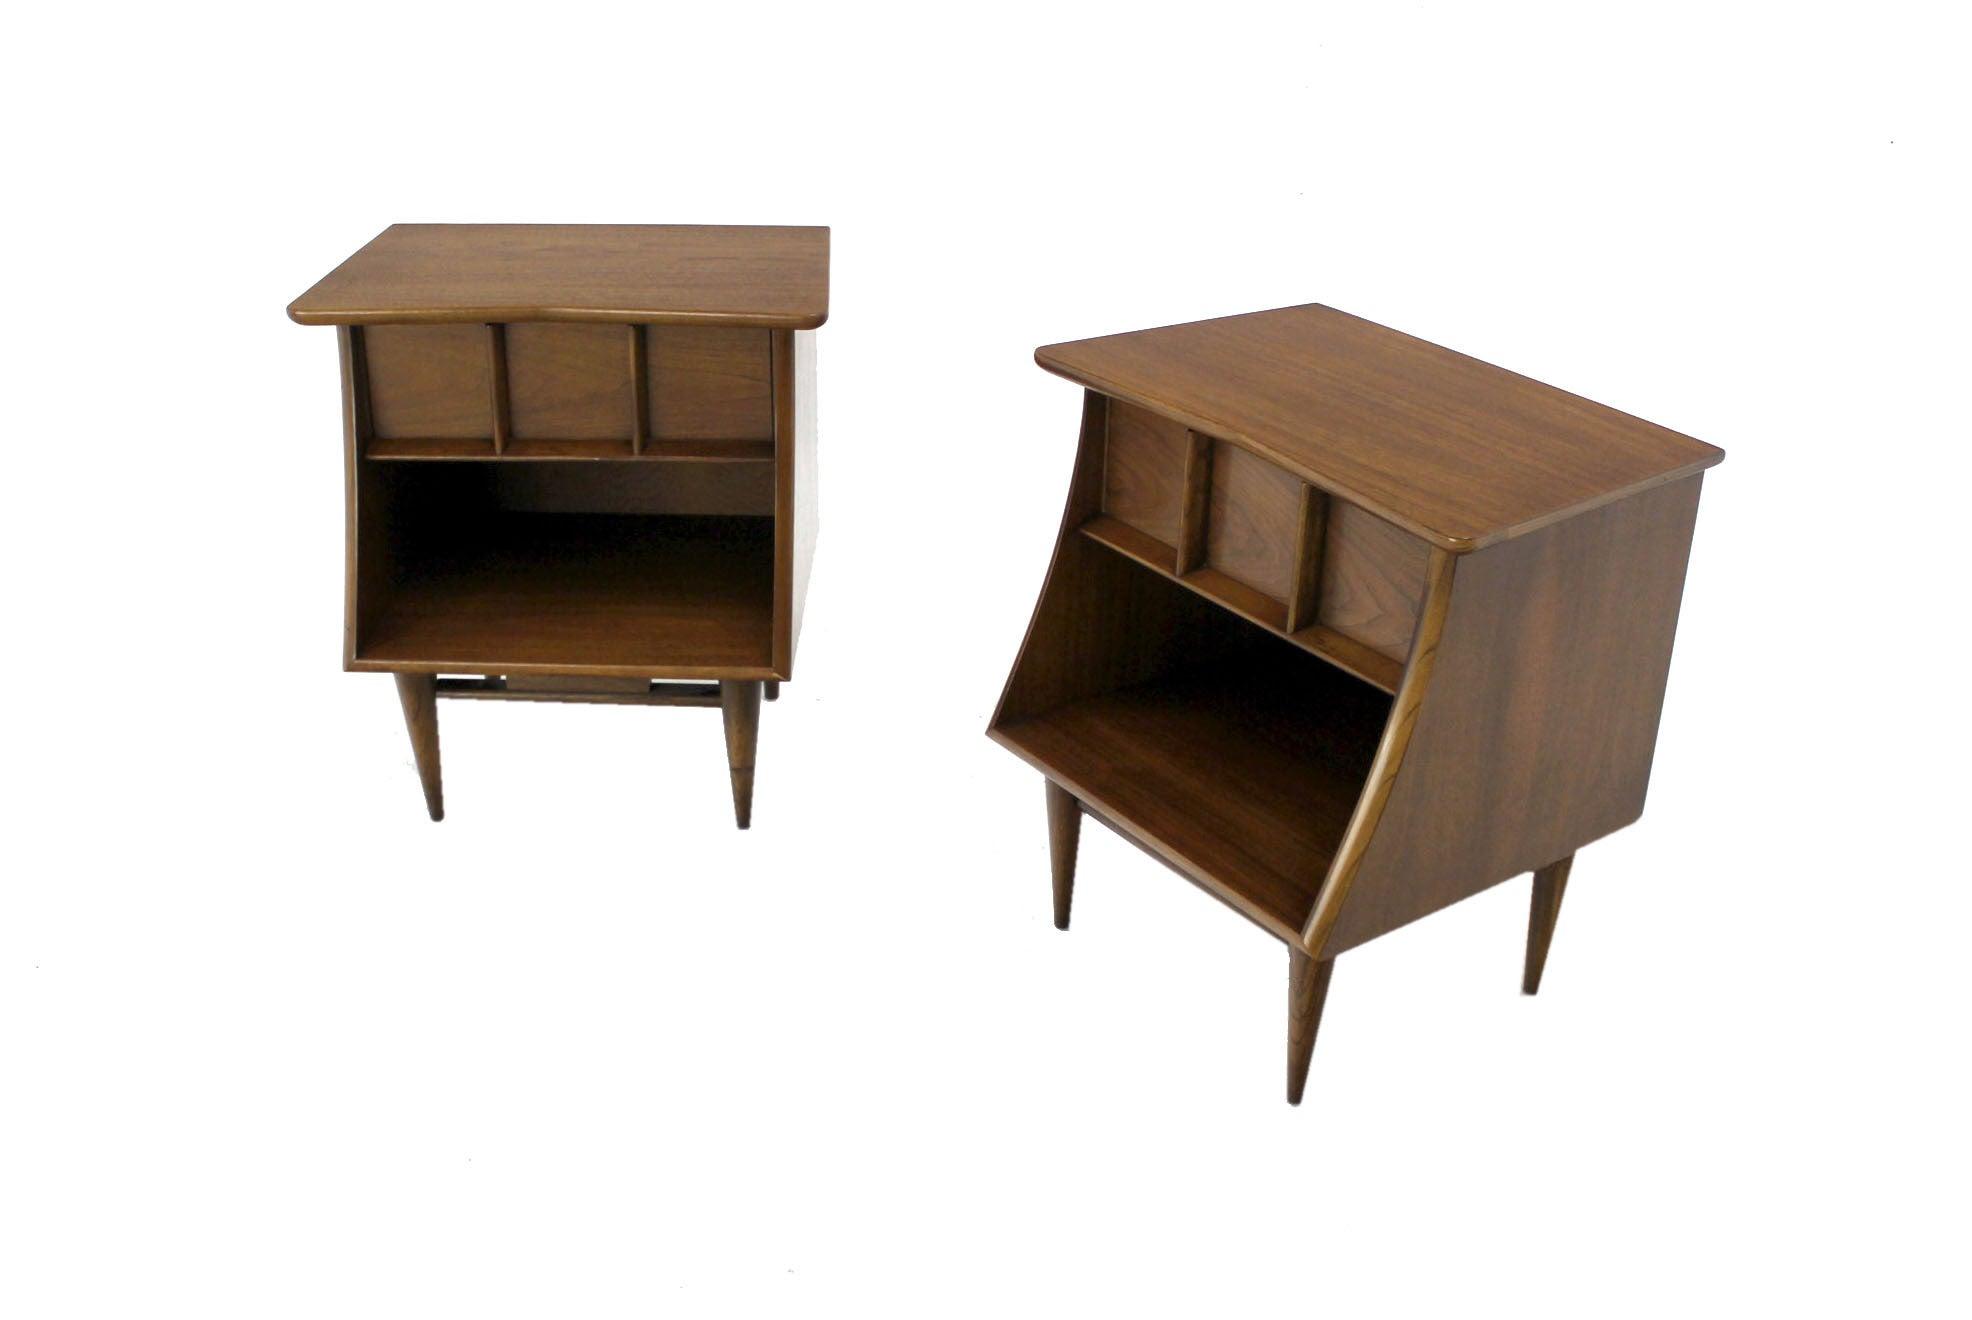 Pair of Danish Mid-Century Modern Walnut End Tables